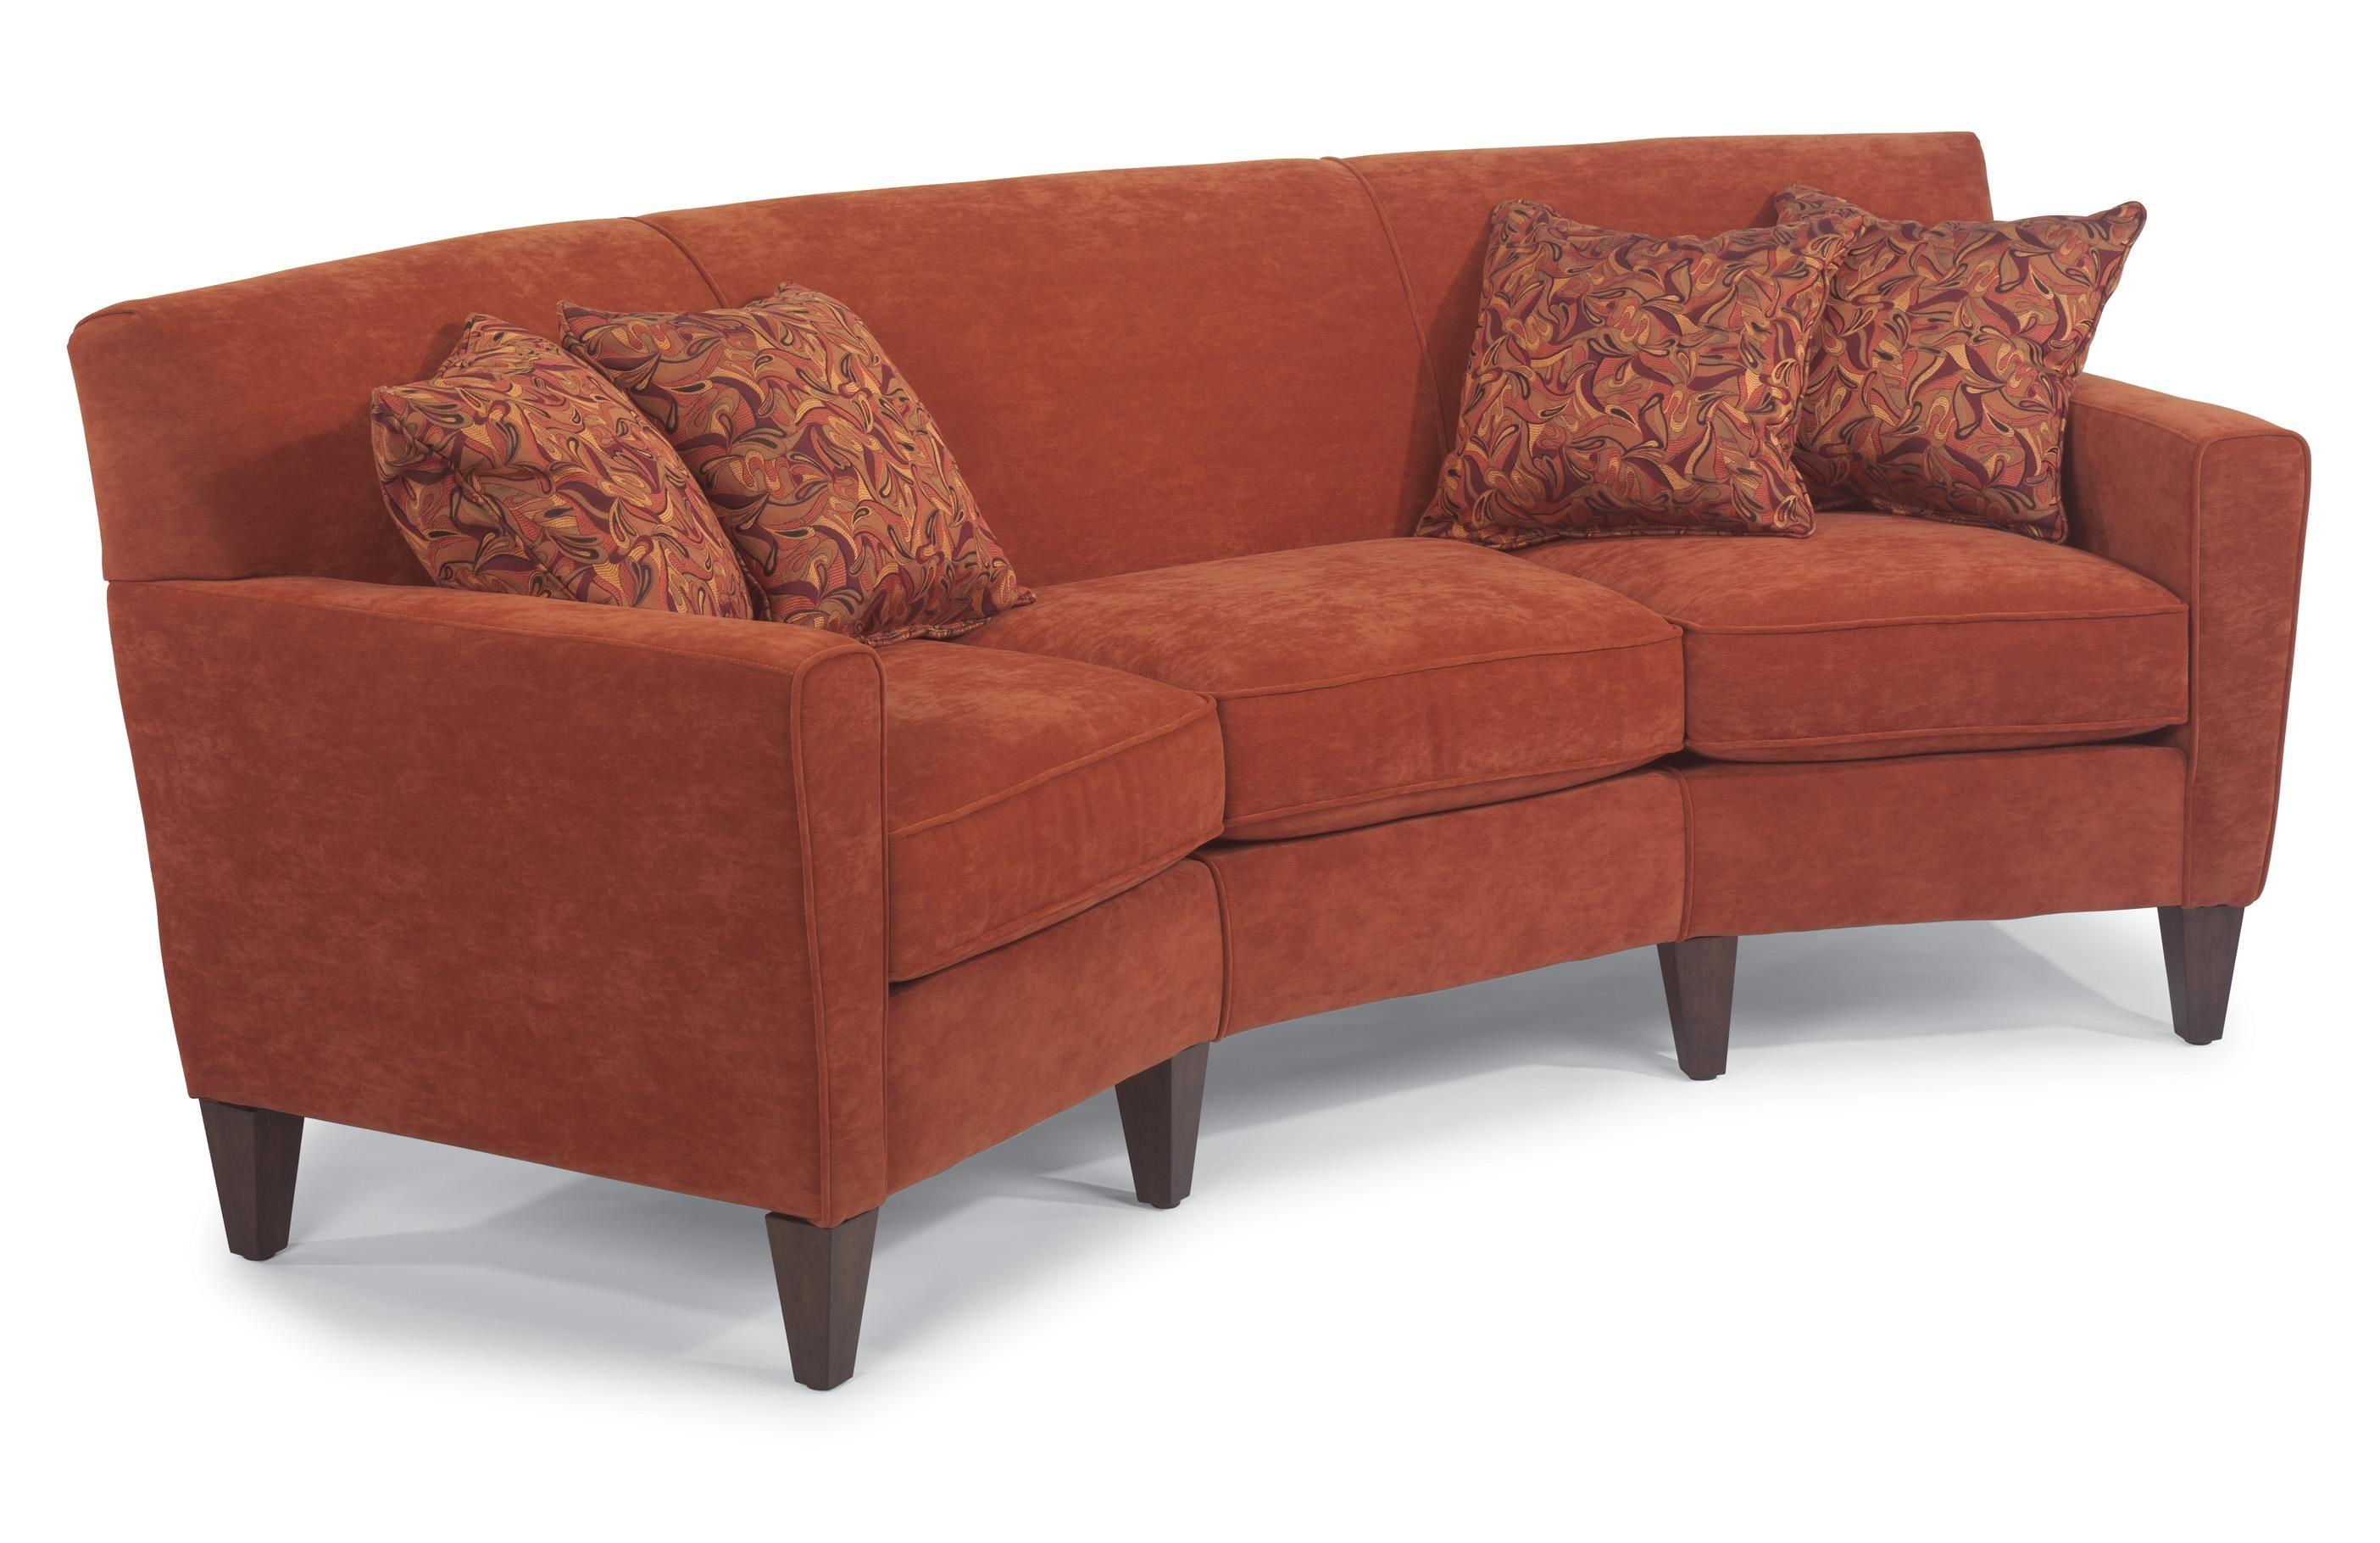 Janesville Sofa Contemporary Leather Sofa Modern Leather Sofa